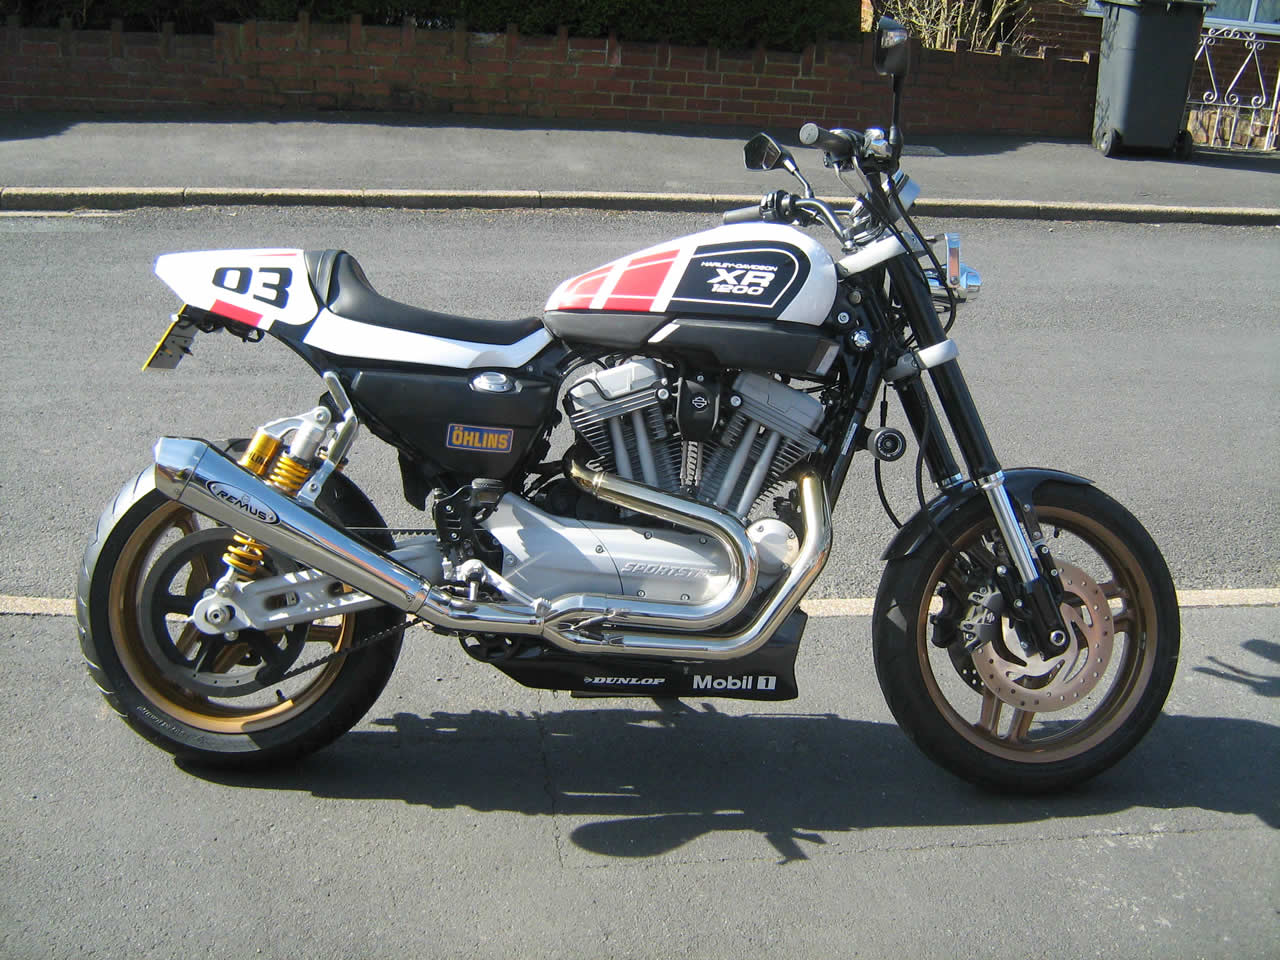 Harley Davidson XR 1200 Sportster – Imagerefinishers